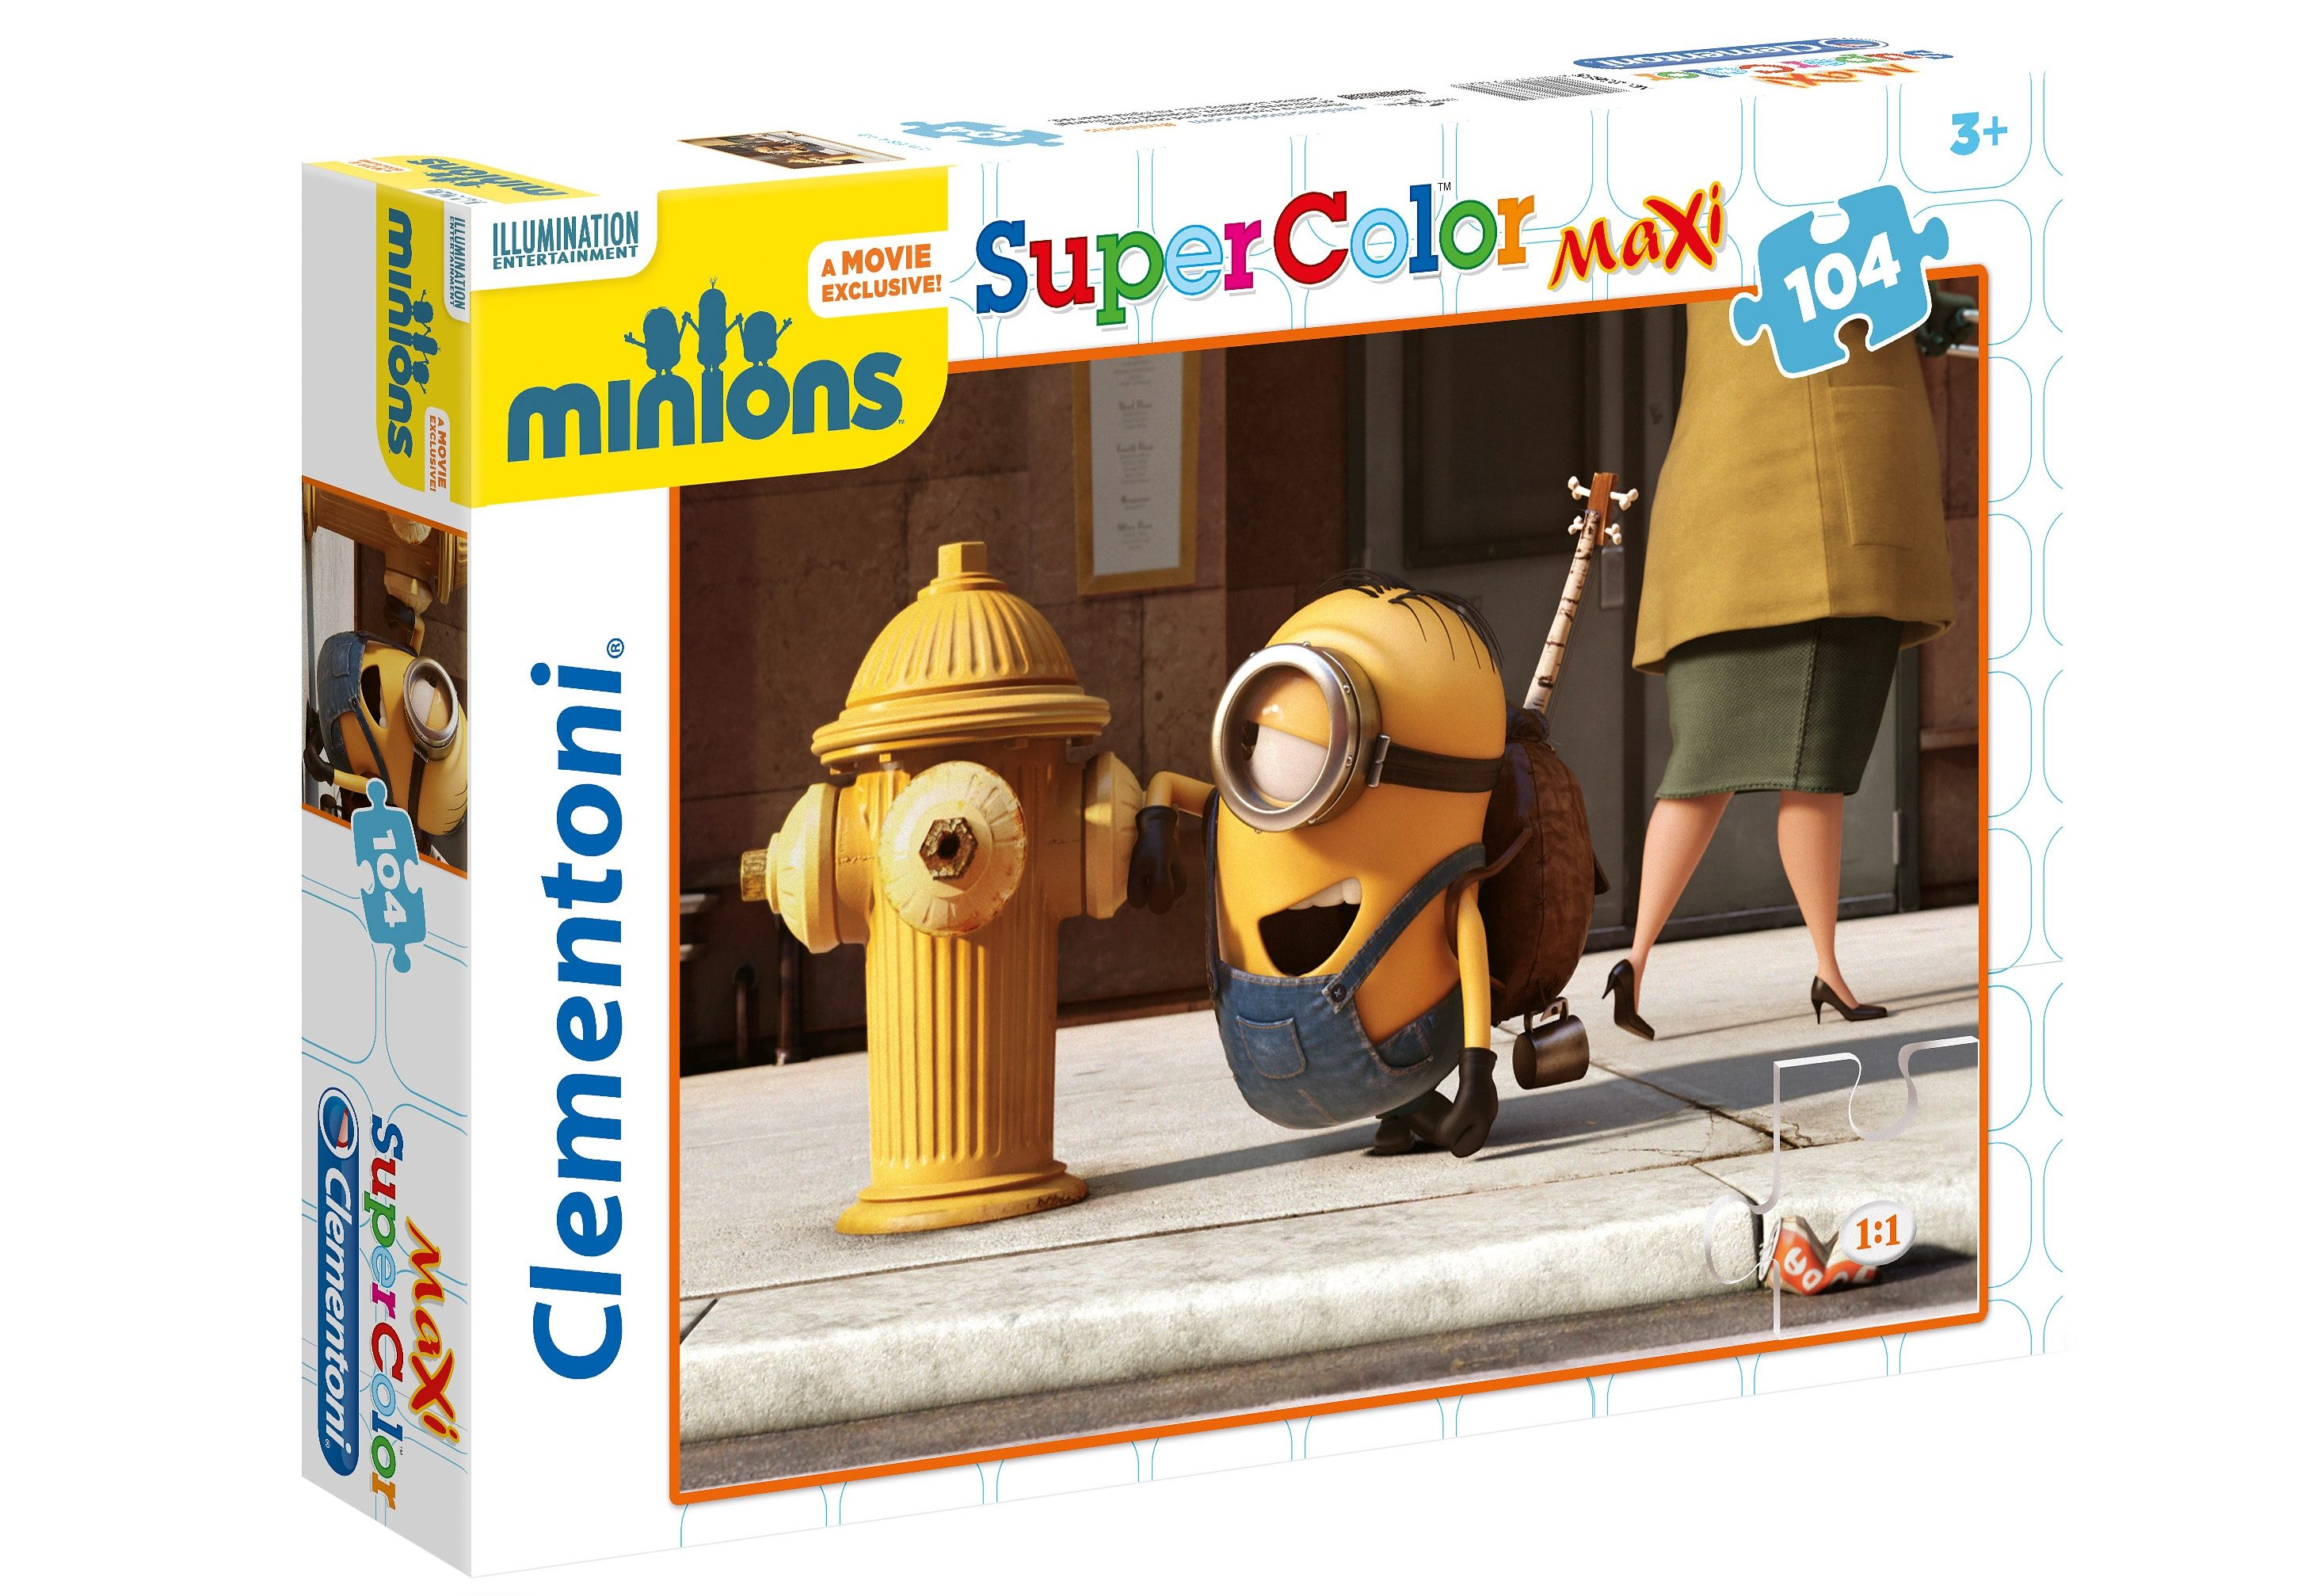 Clementoni Maxi-Puzzle, 104 Teile, »Illumination Entertainment, Minions«